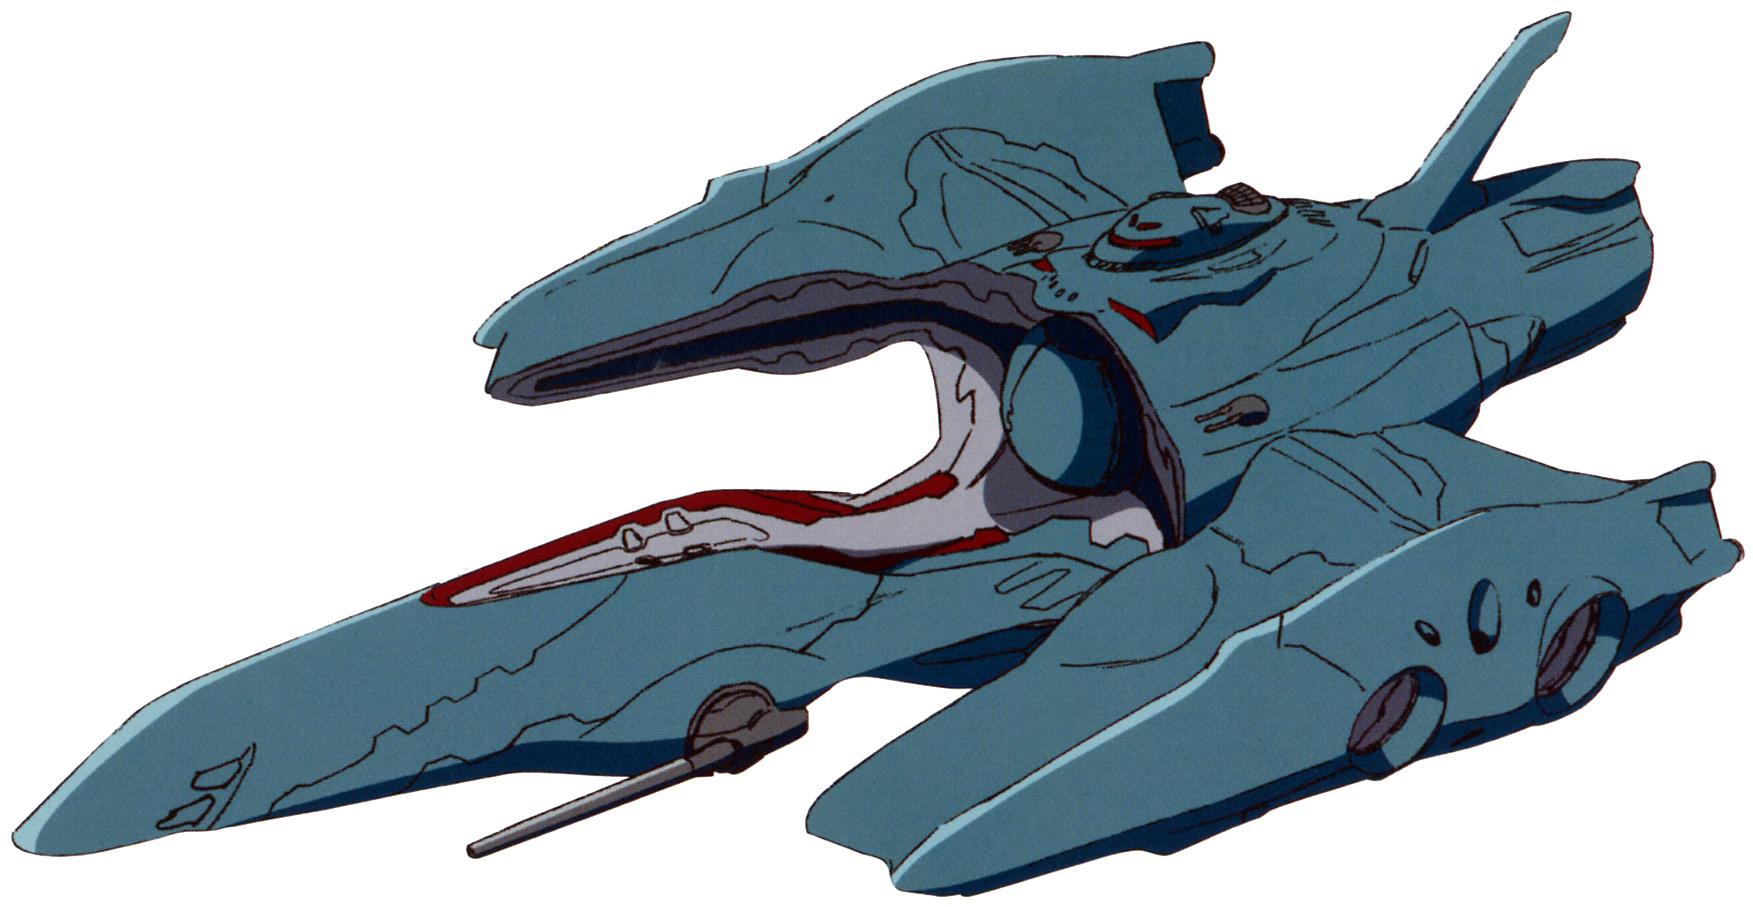 File:Nazca class destroyer (gundam).jpg